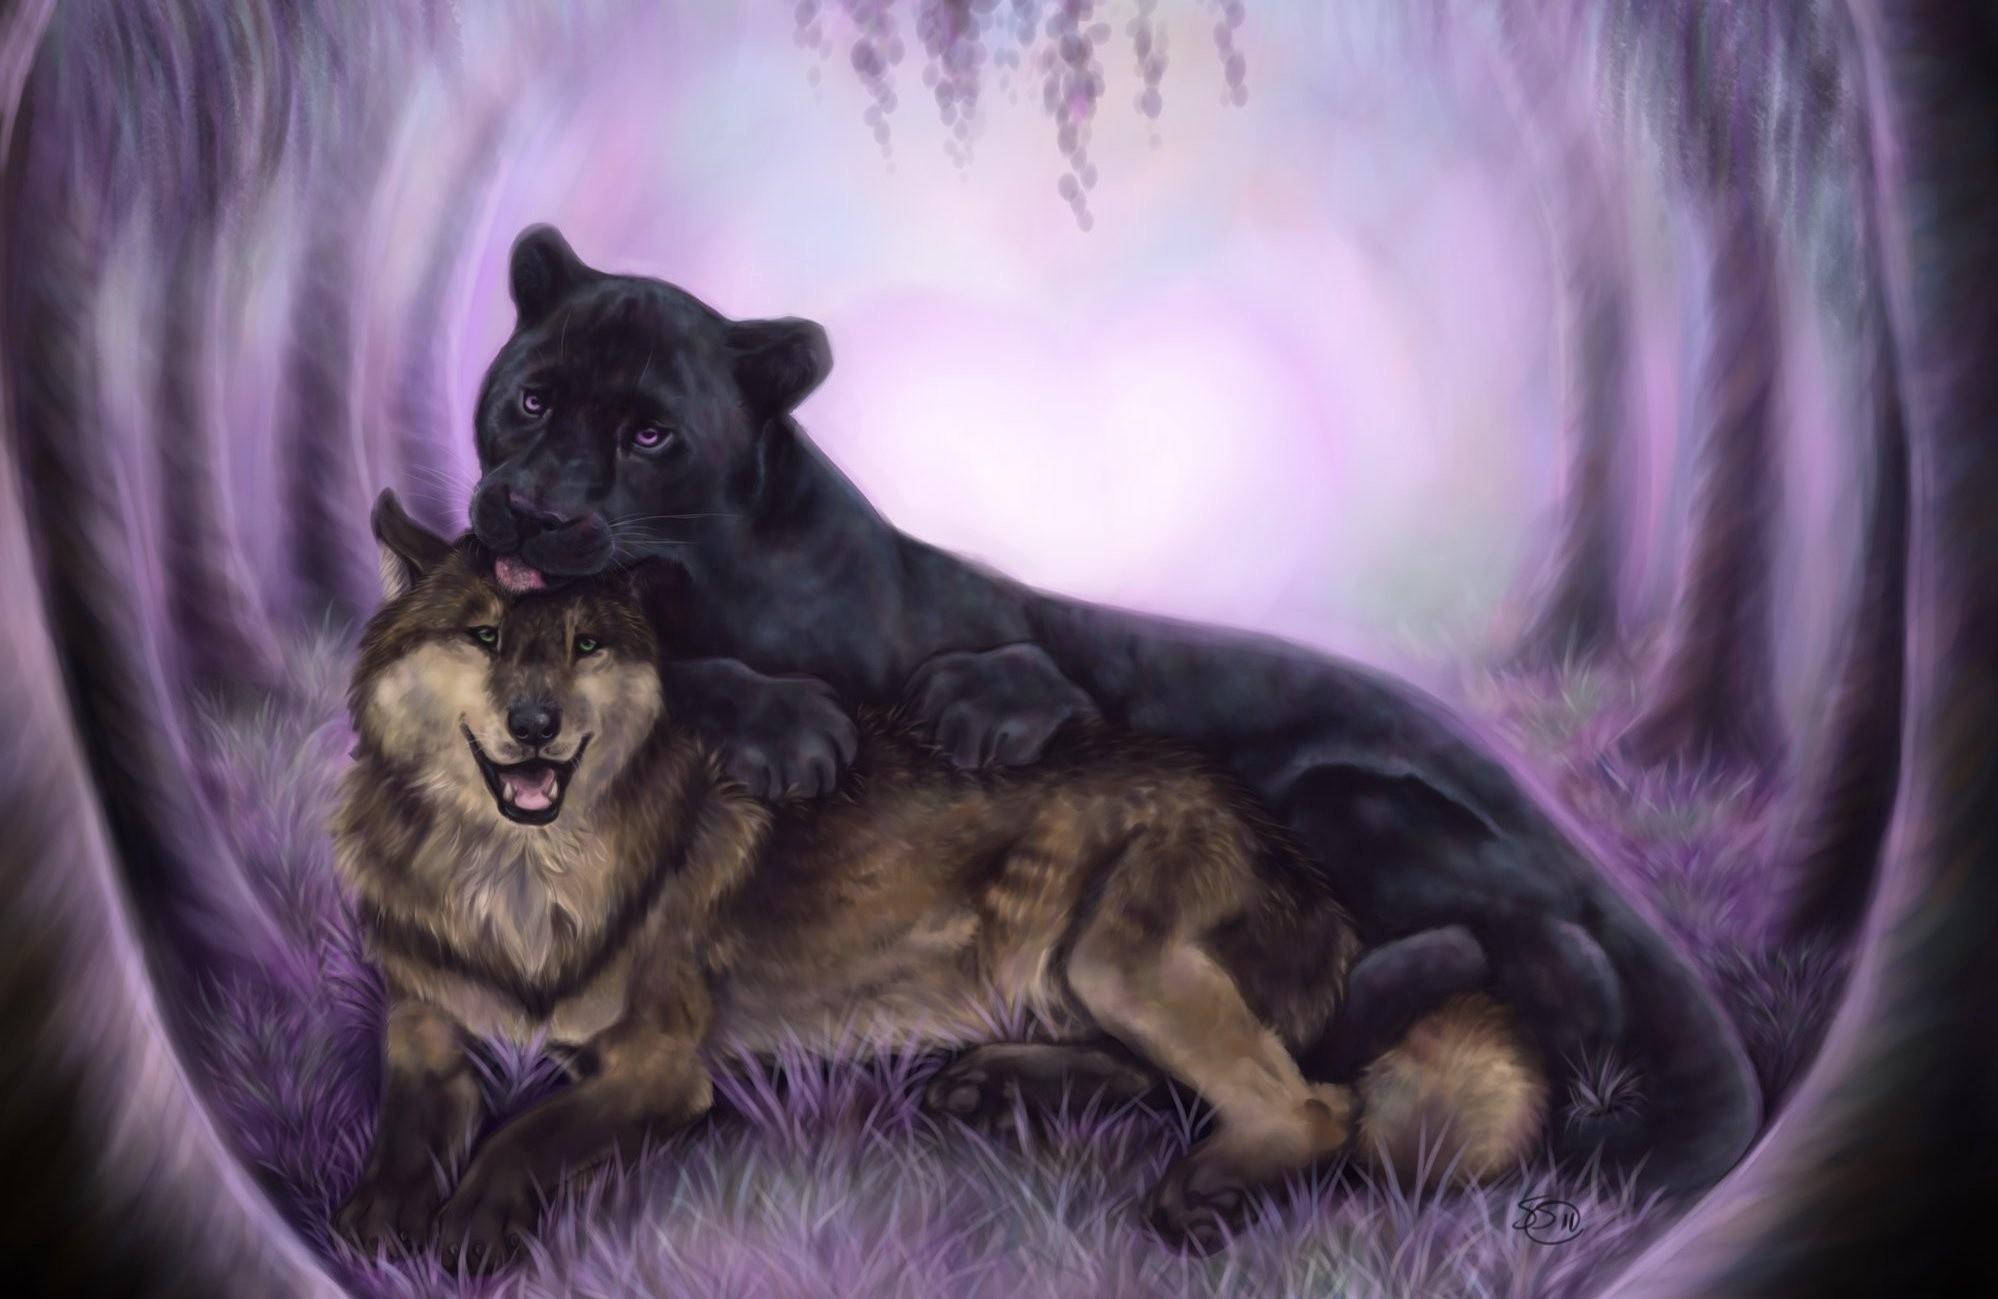 1998x1299 Black Panther Wallpaper With Blue Eyes Wolf Art Black Animal  Panther